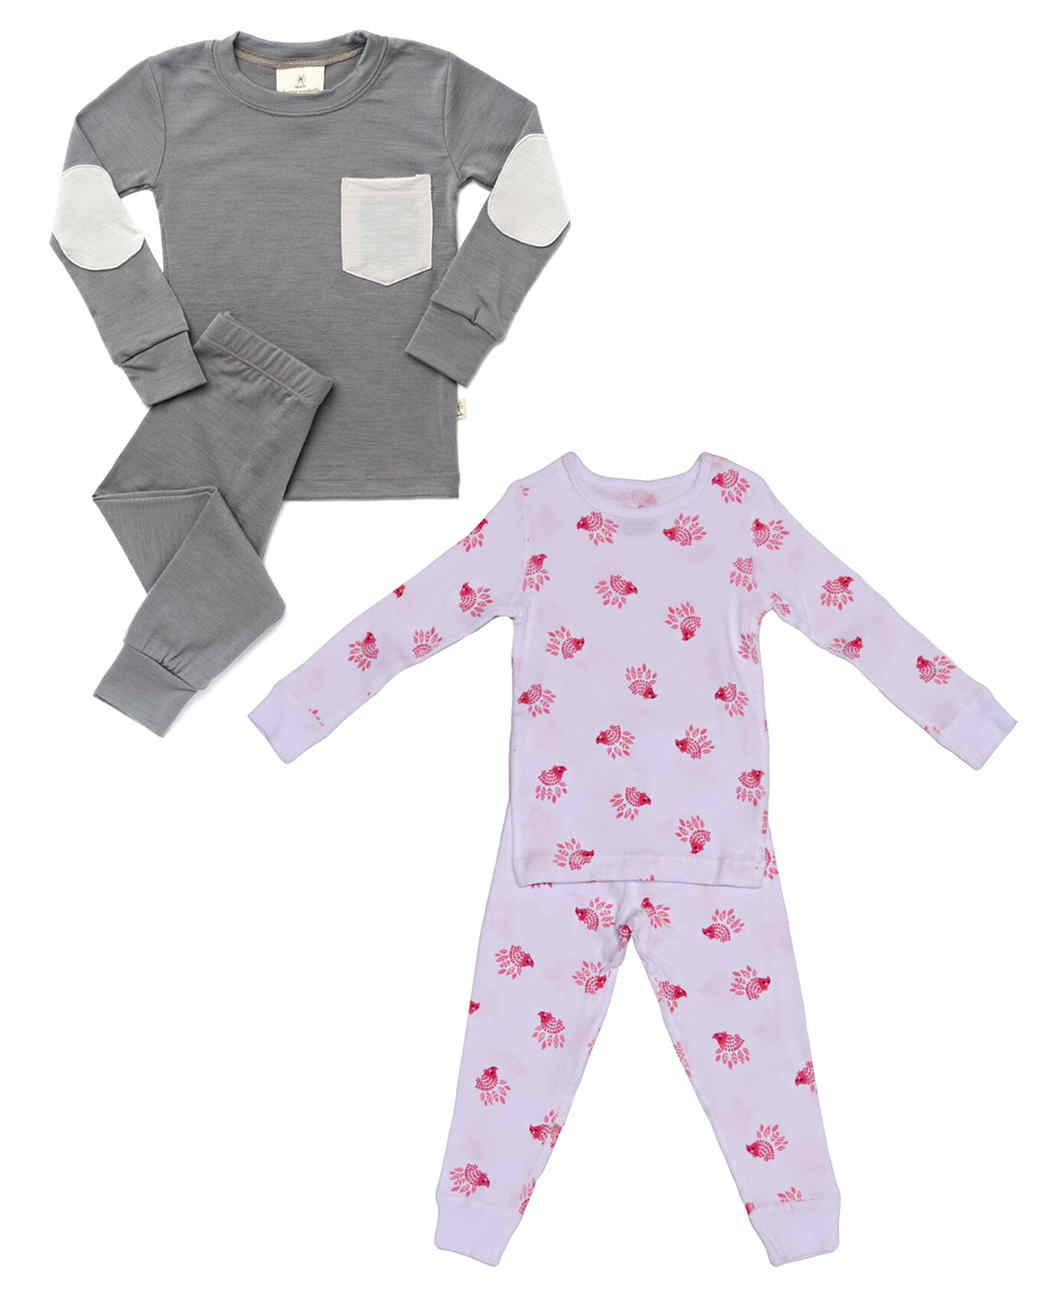 hedgehog and merino wool kids pajamas